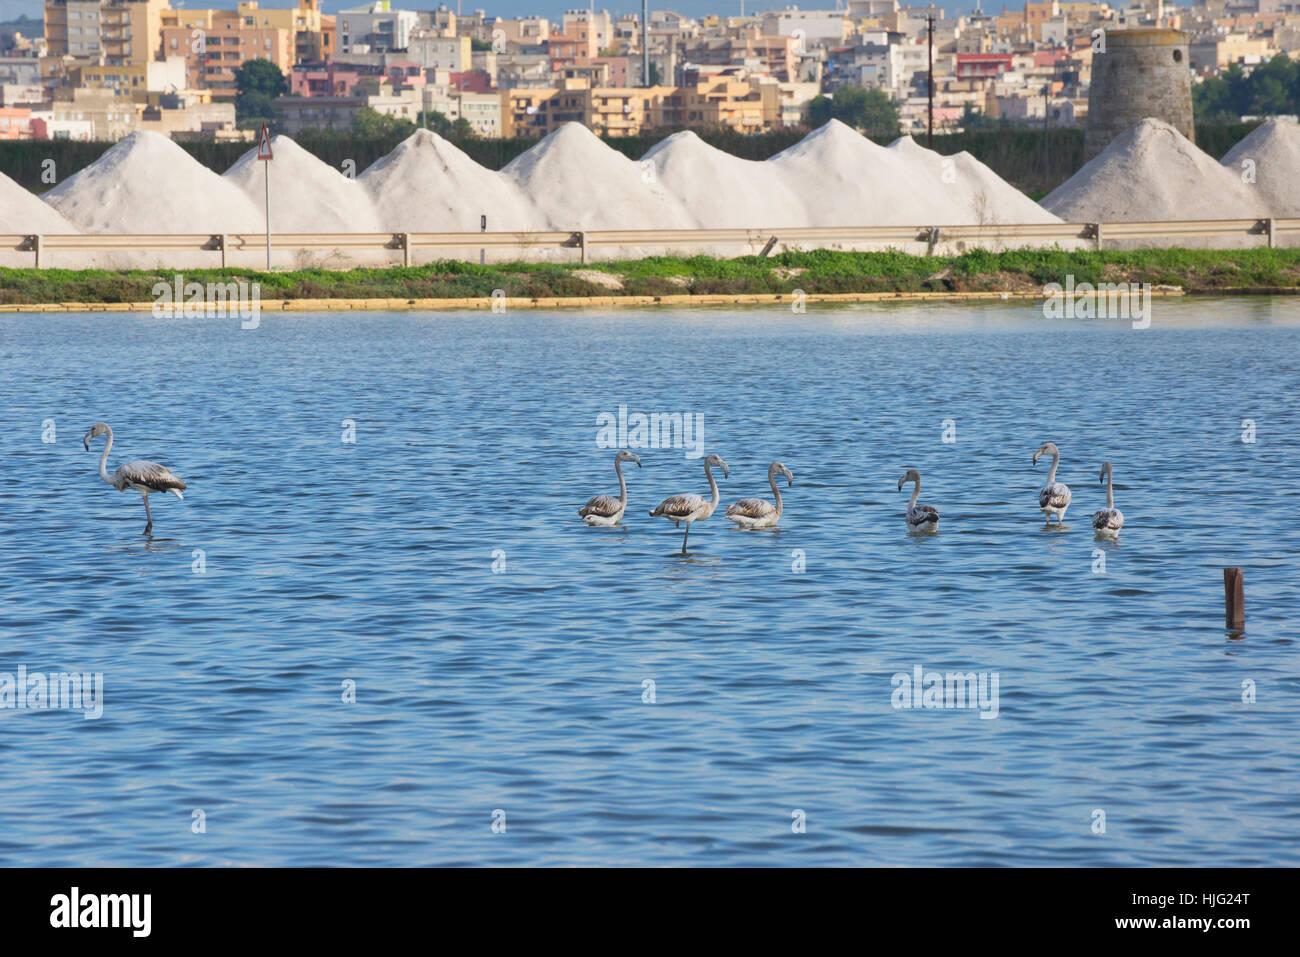 Flamingos at Salt Pans, Trapani, Sicily, Italy. - Stock Image